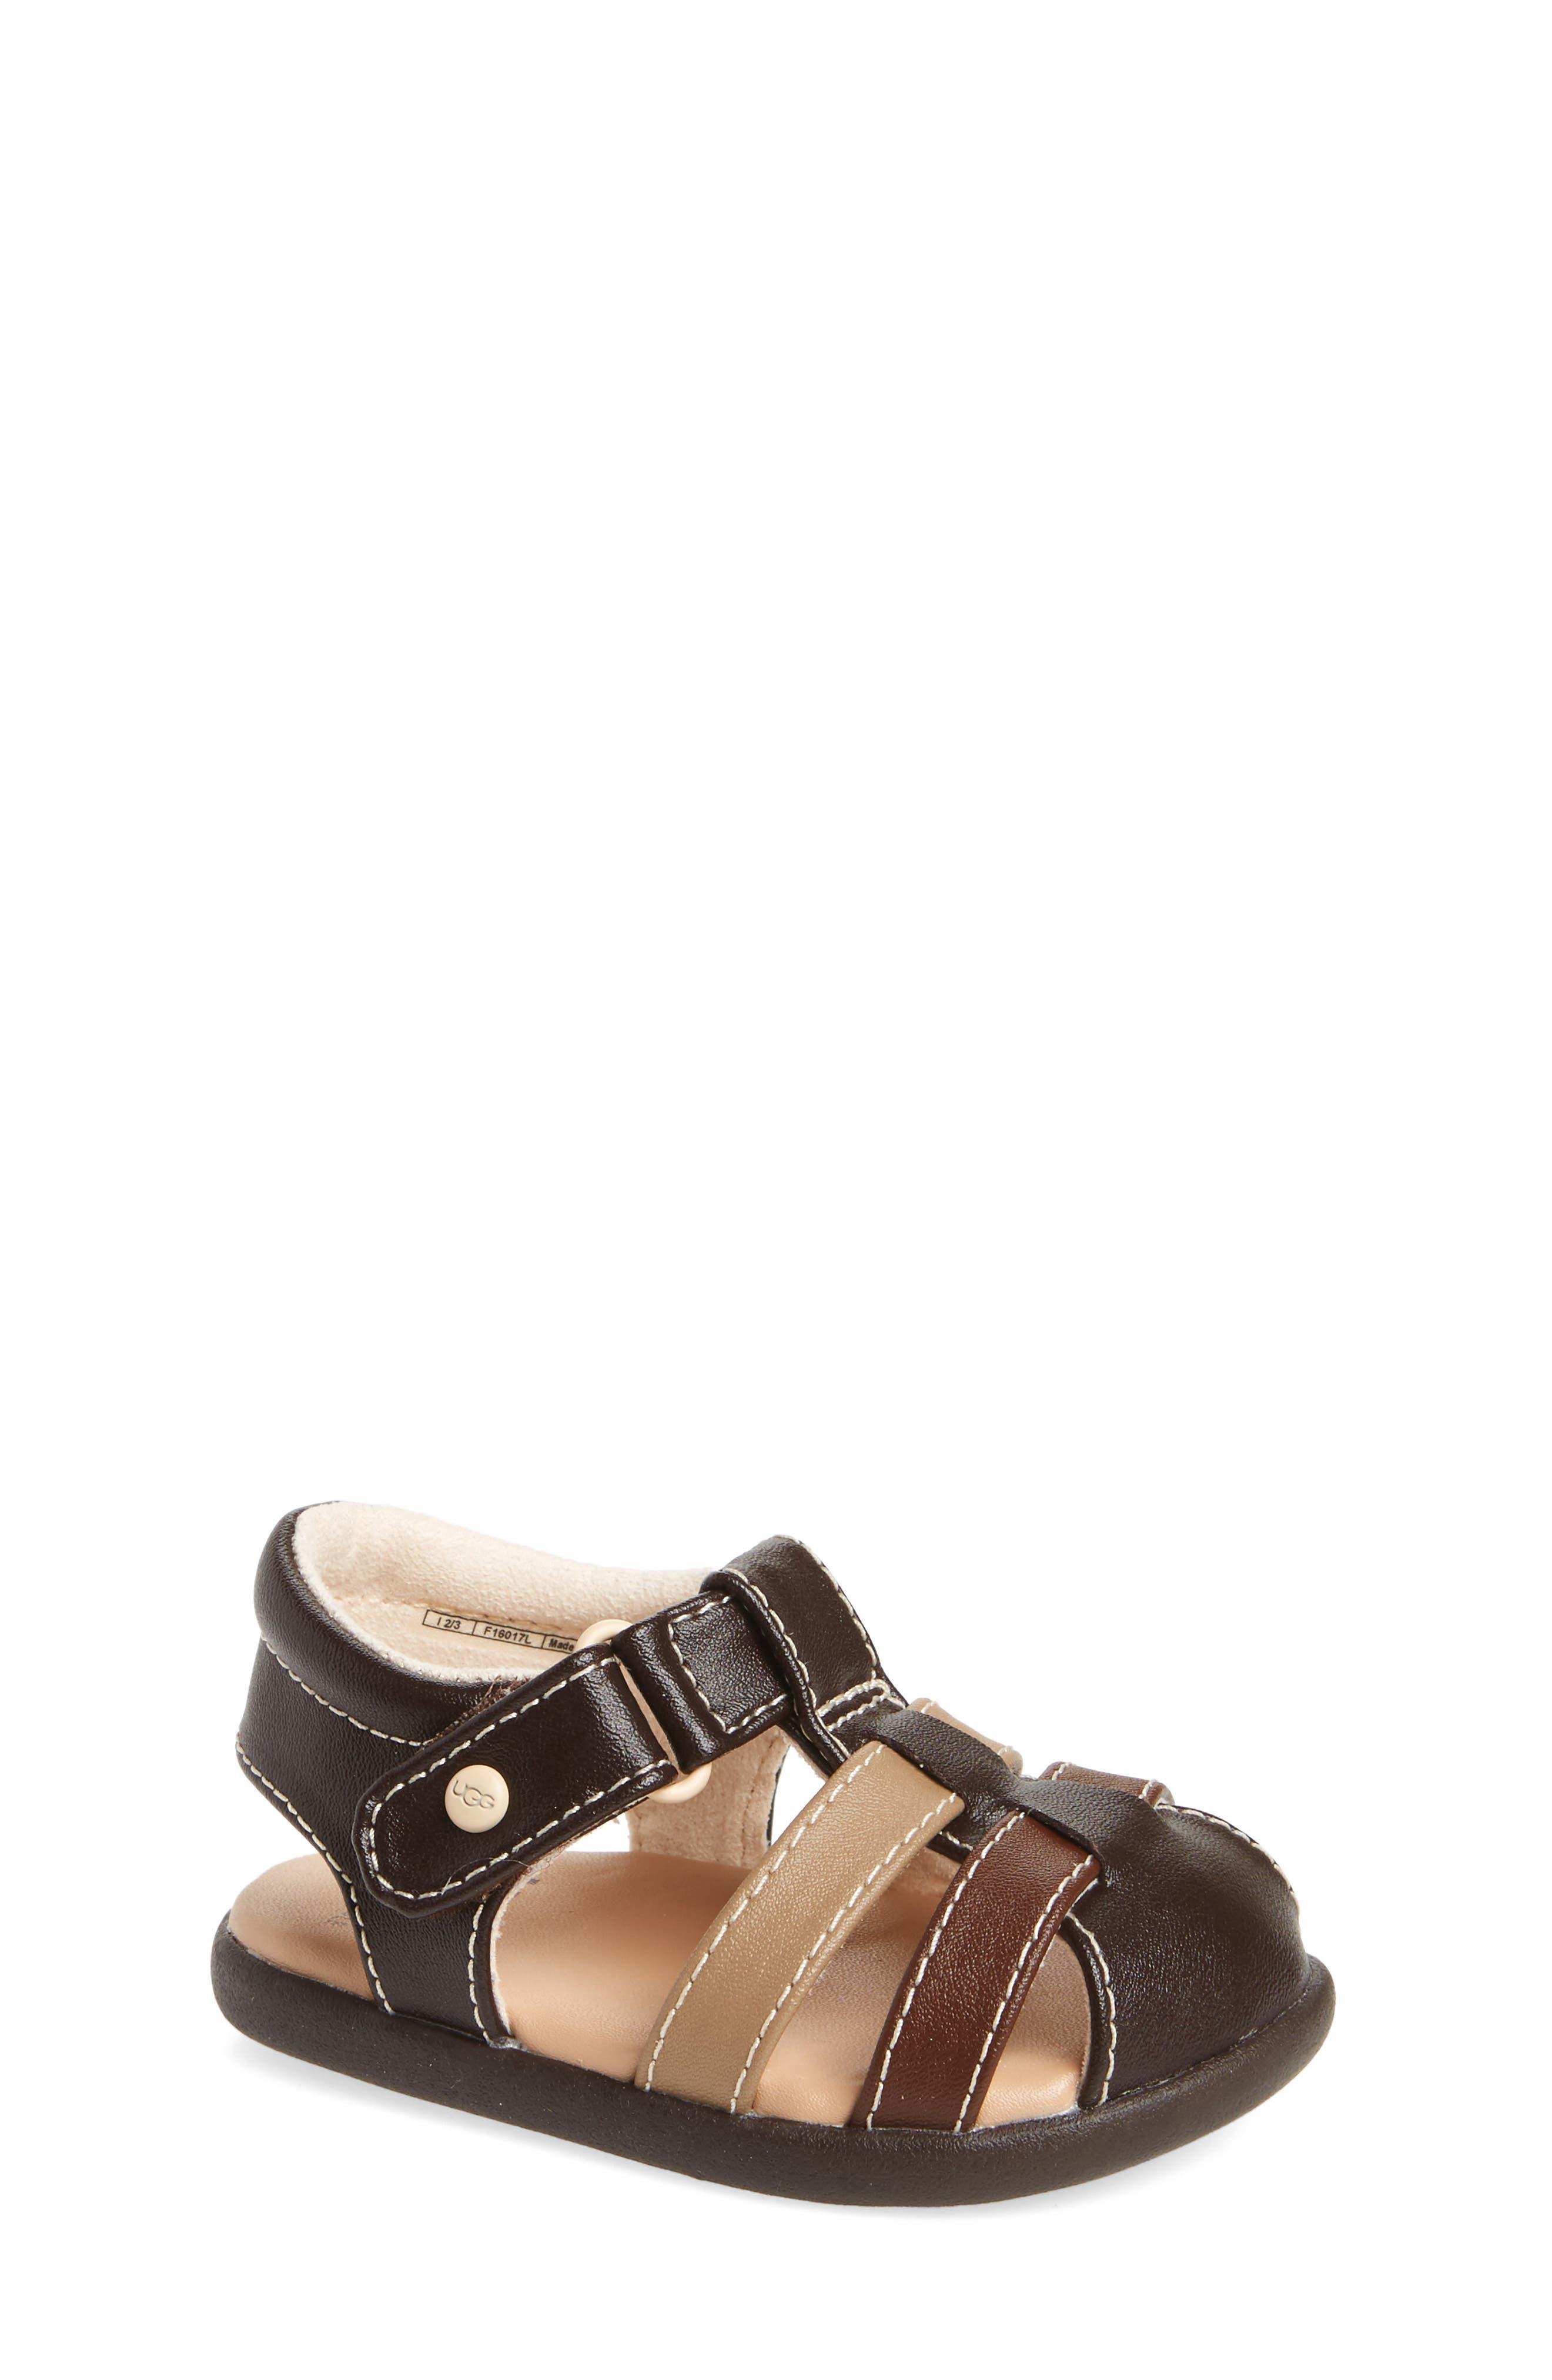 Kolding Sandal,                         Main,                         color, STOUT